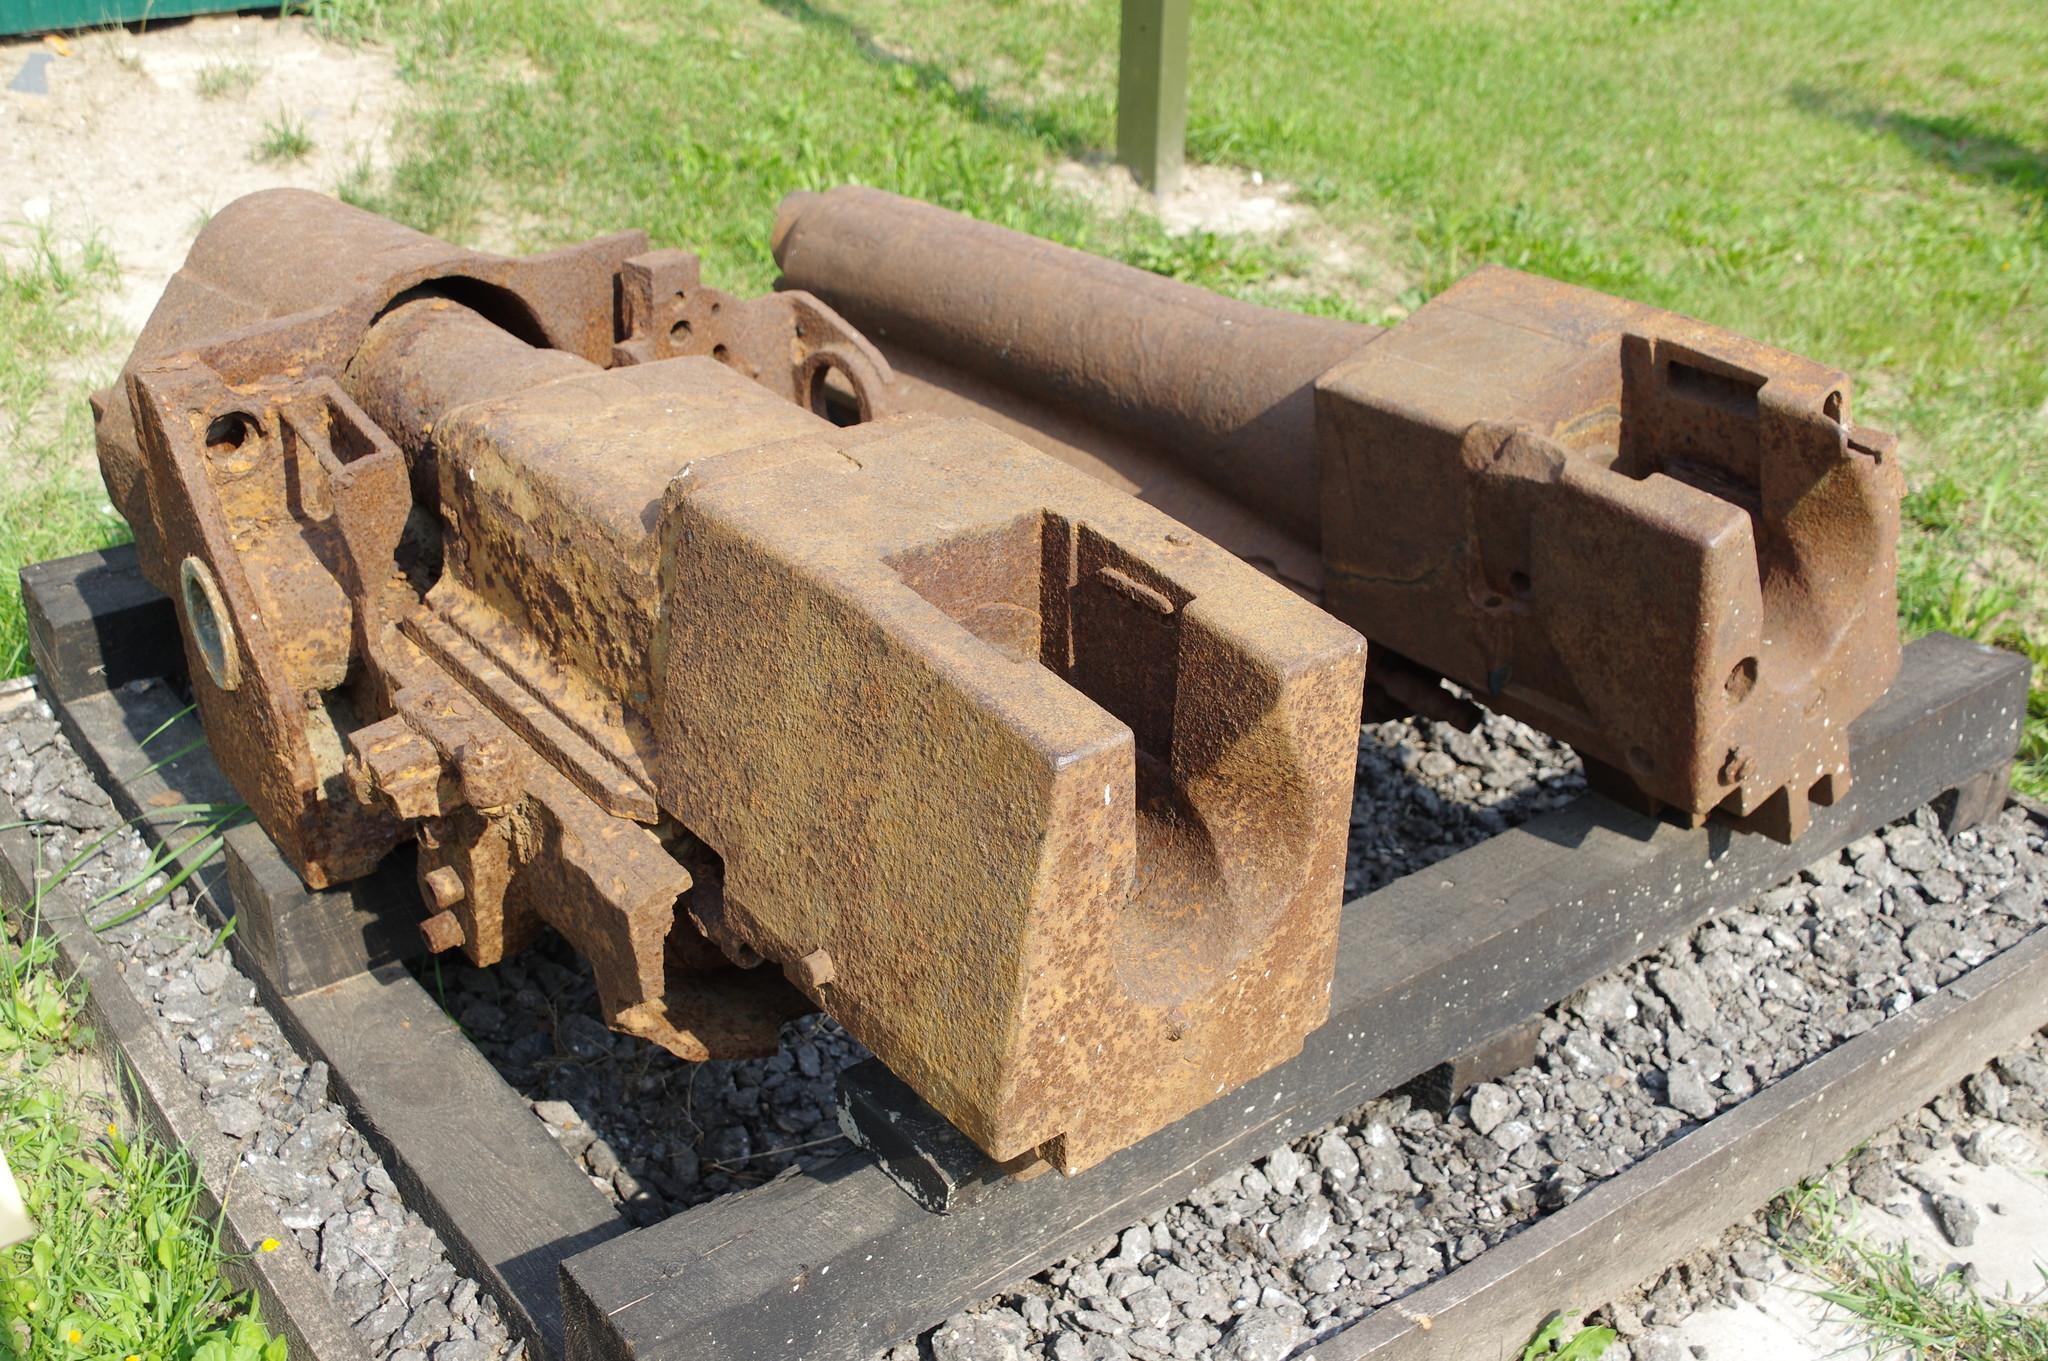 Фрагмент 76,2-мм пушки Ф-34 танка Т-34 и фрагмент 76,2-мм немецкой противотанковой пушки PaK36(r)